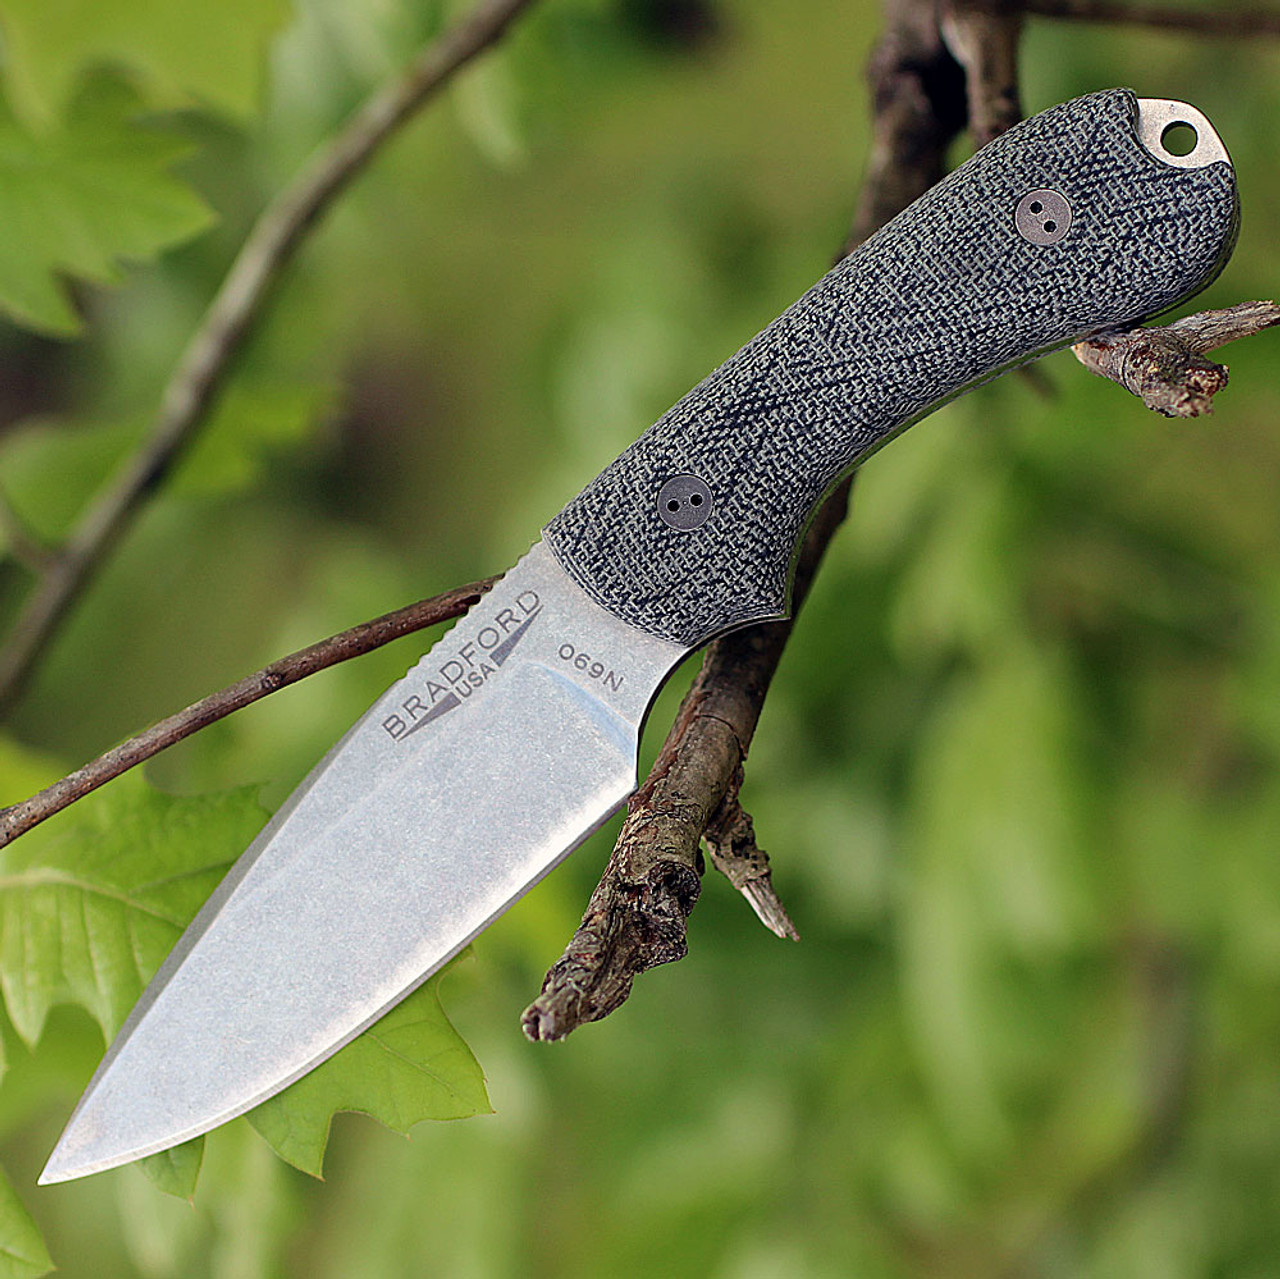 "Bradford Guardian3 3D, 3.5"" N690 Plain Blade, Black Micarta Handle"